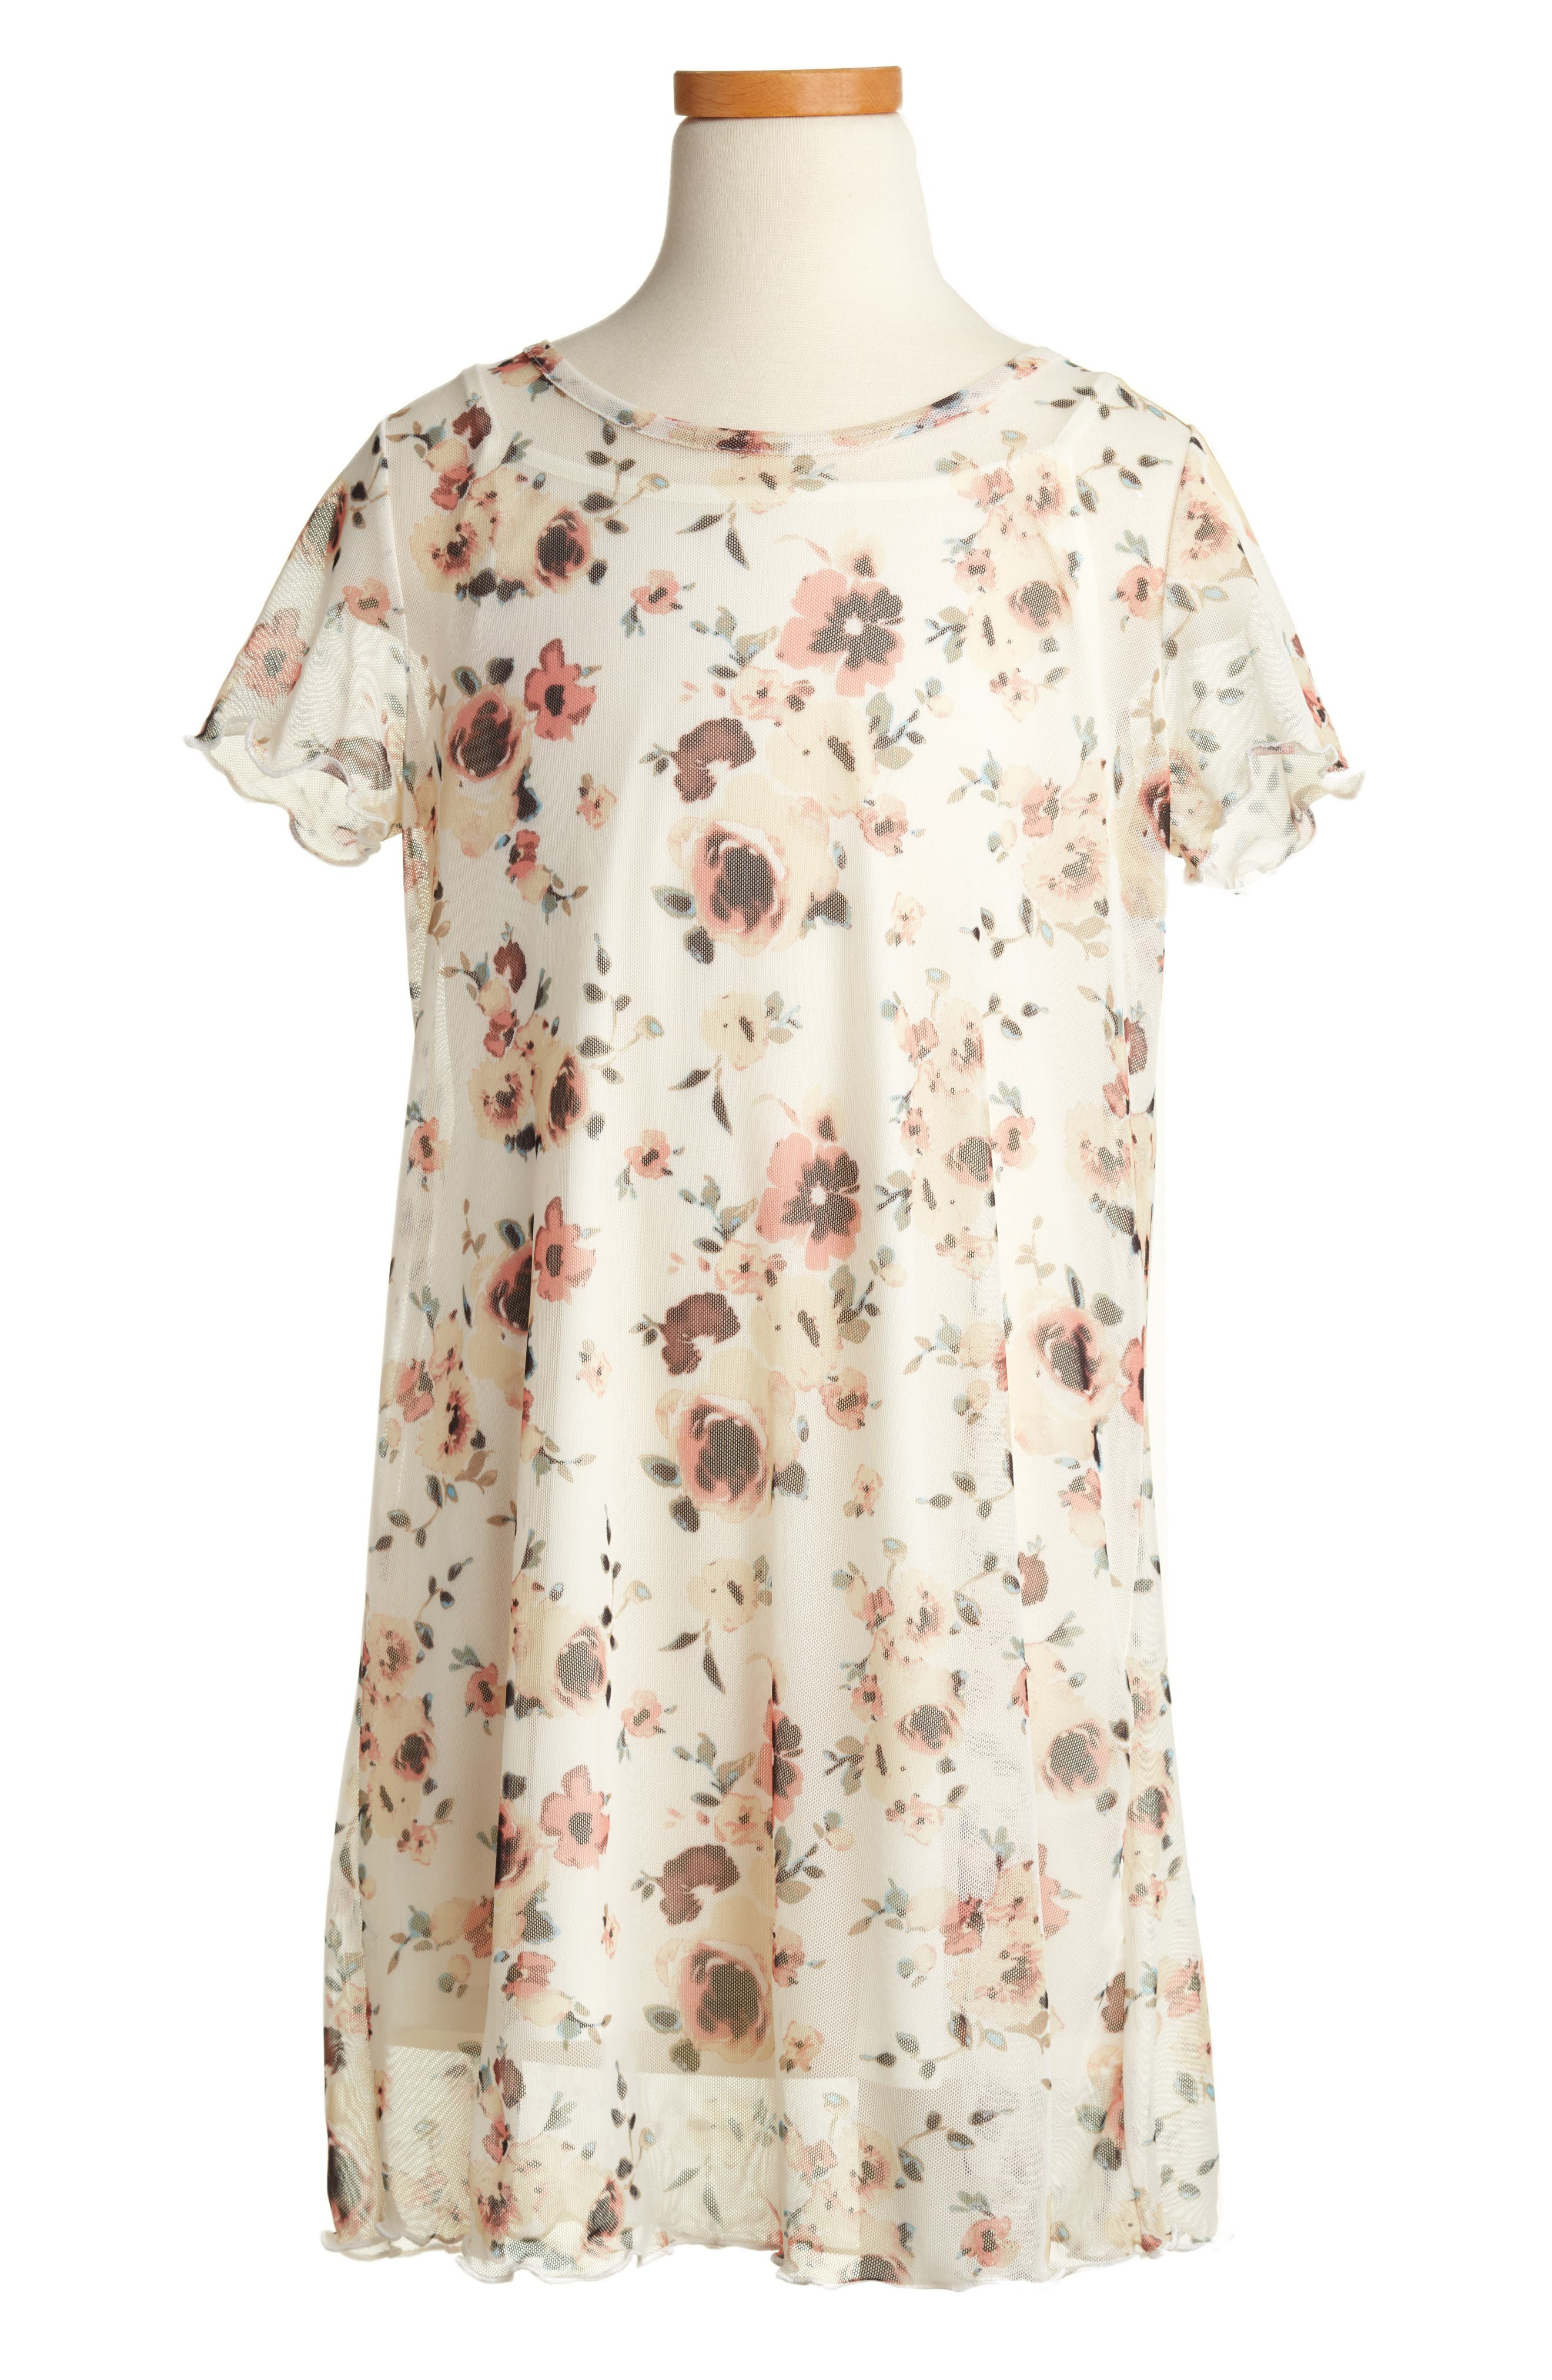 M s evening dress shirts 8x